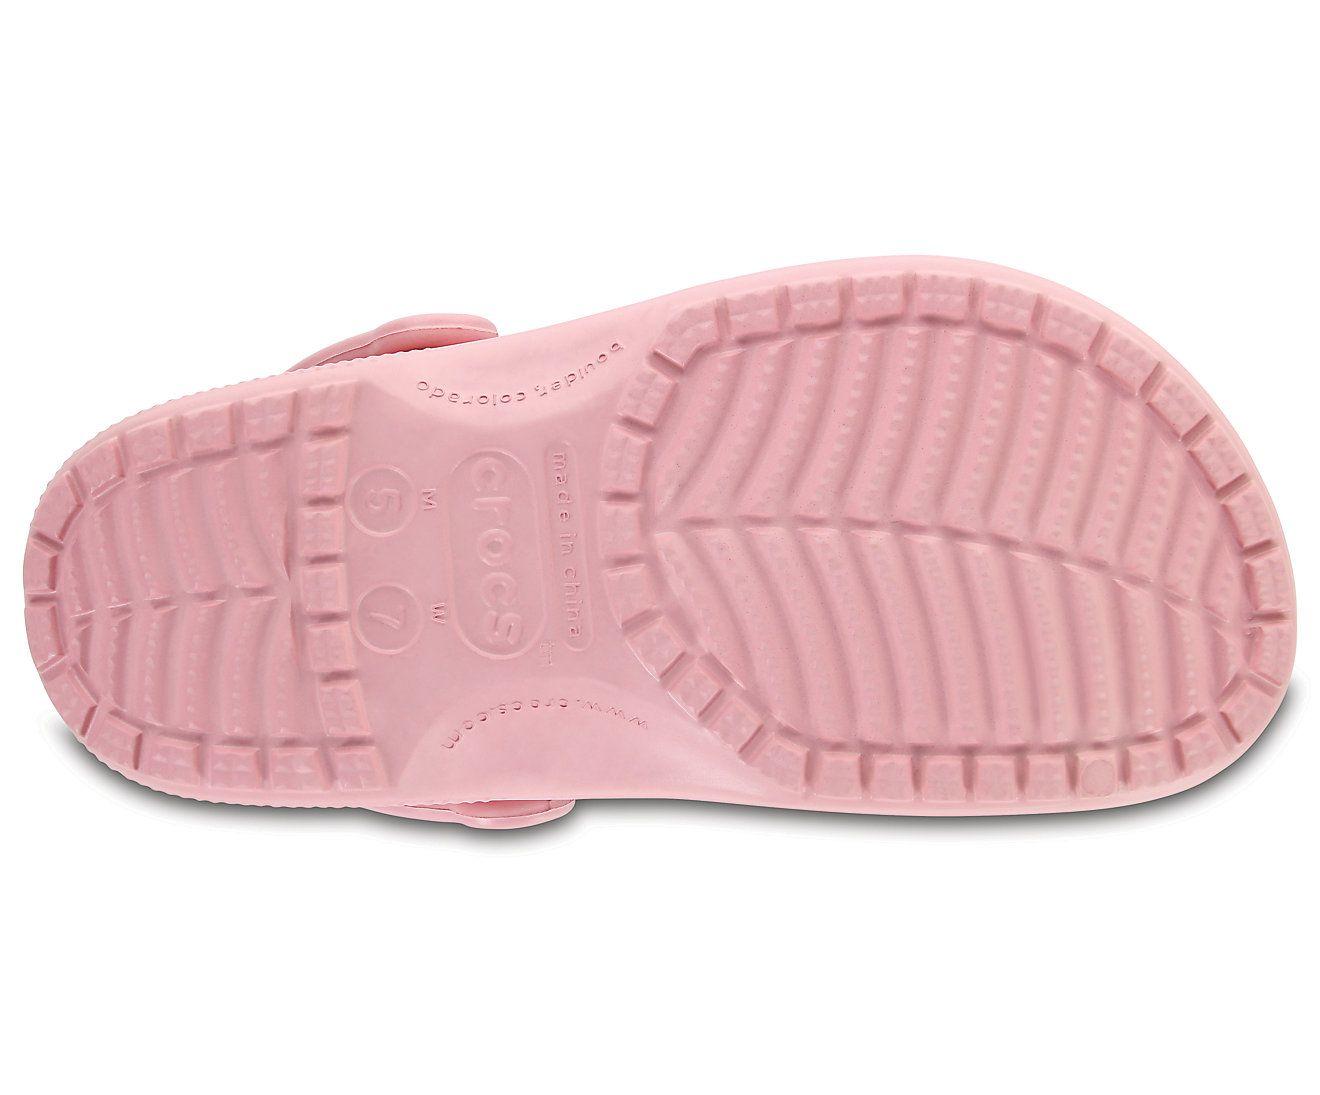 Sandália Crocs Classic Graphic Clog / Cashmere Rose + Nfe